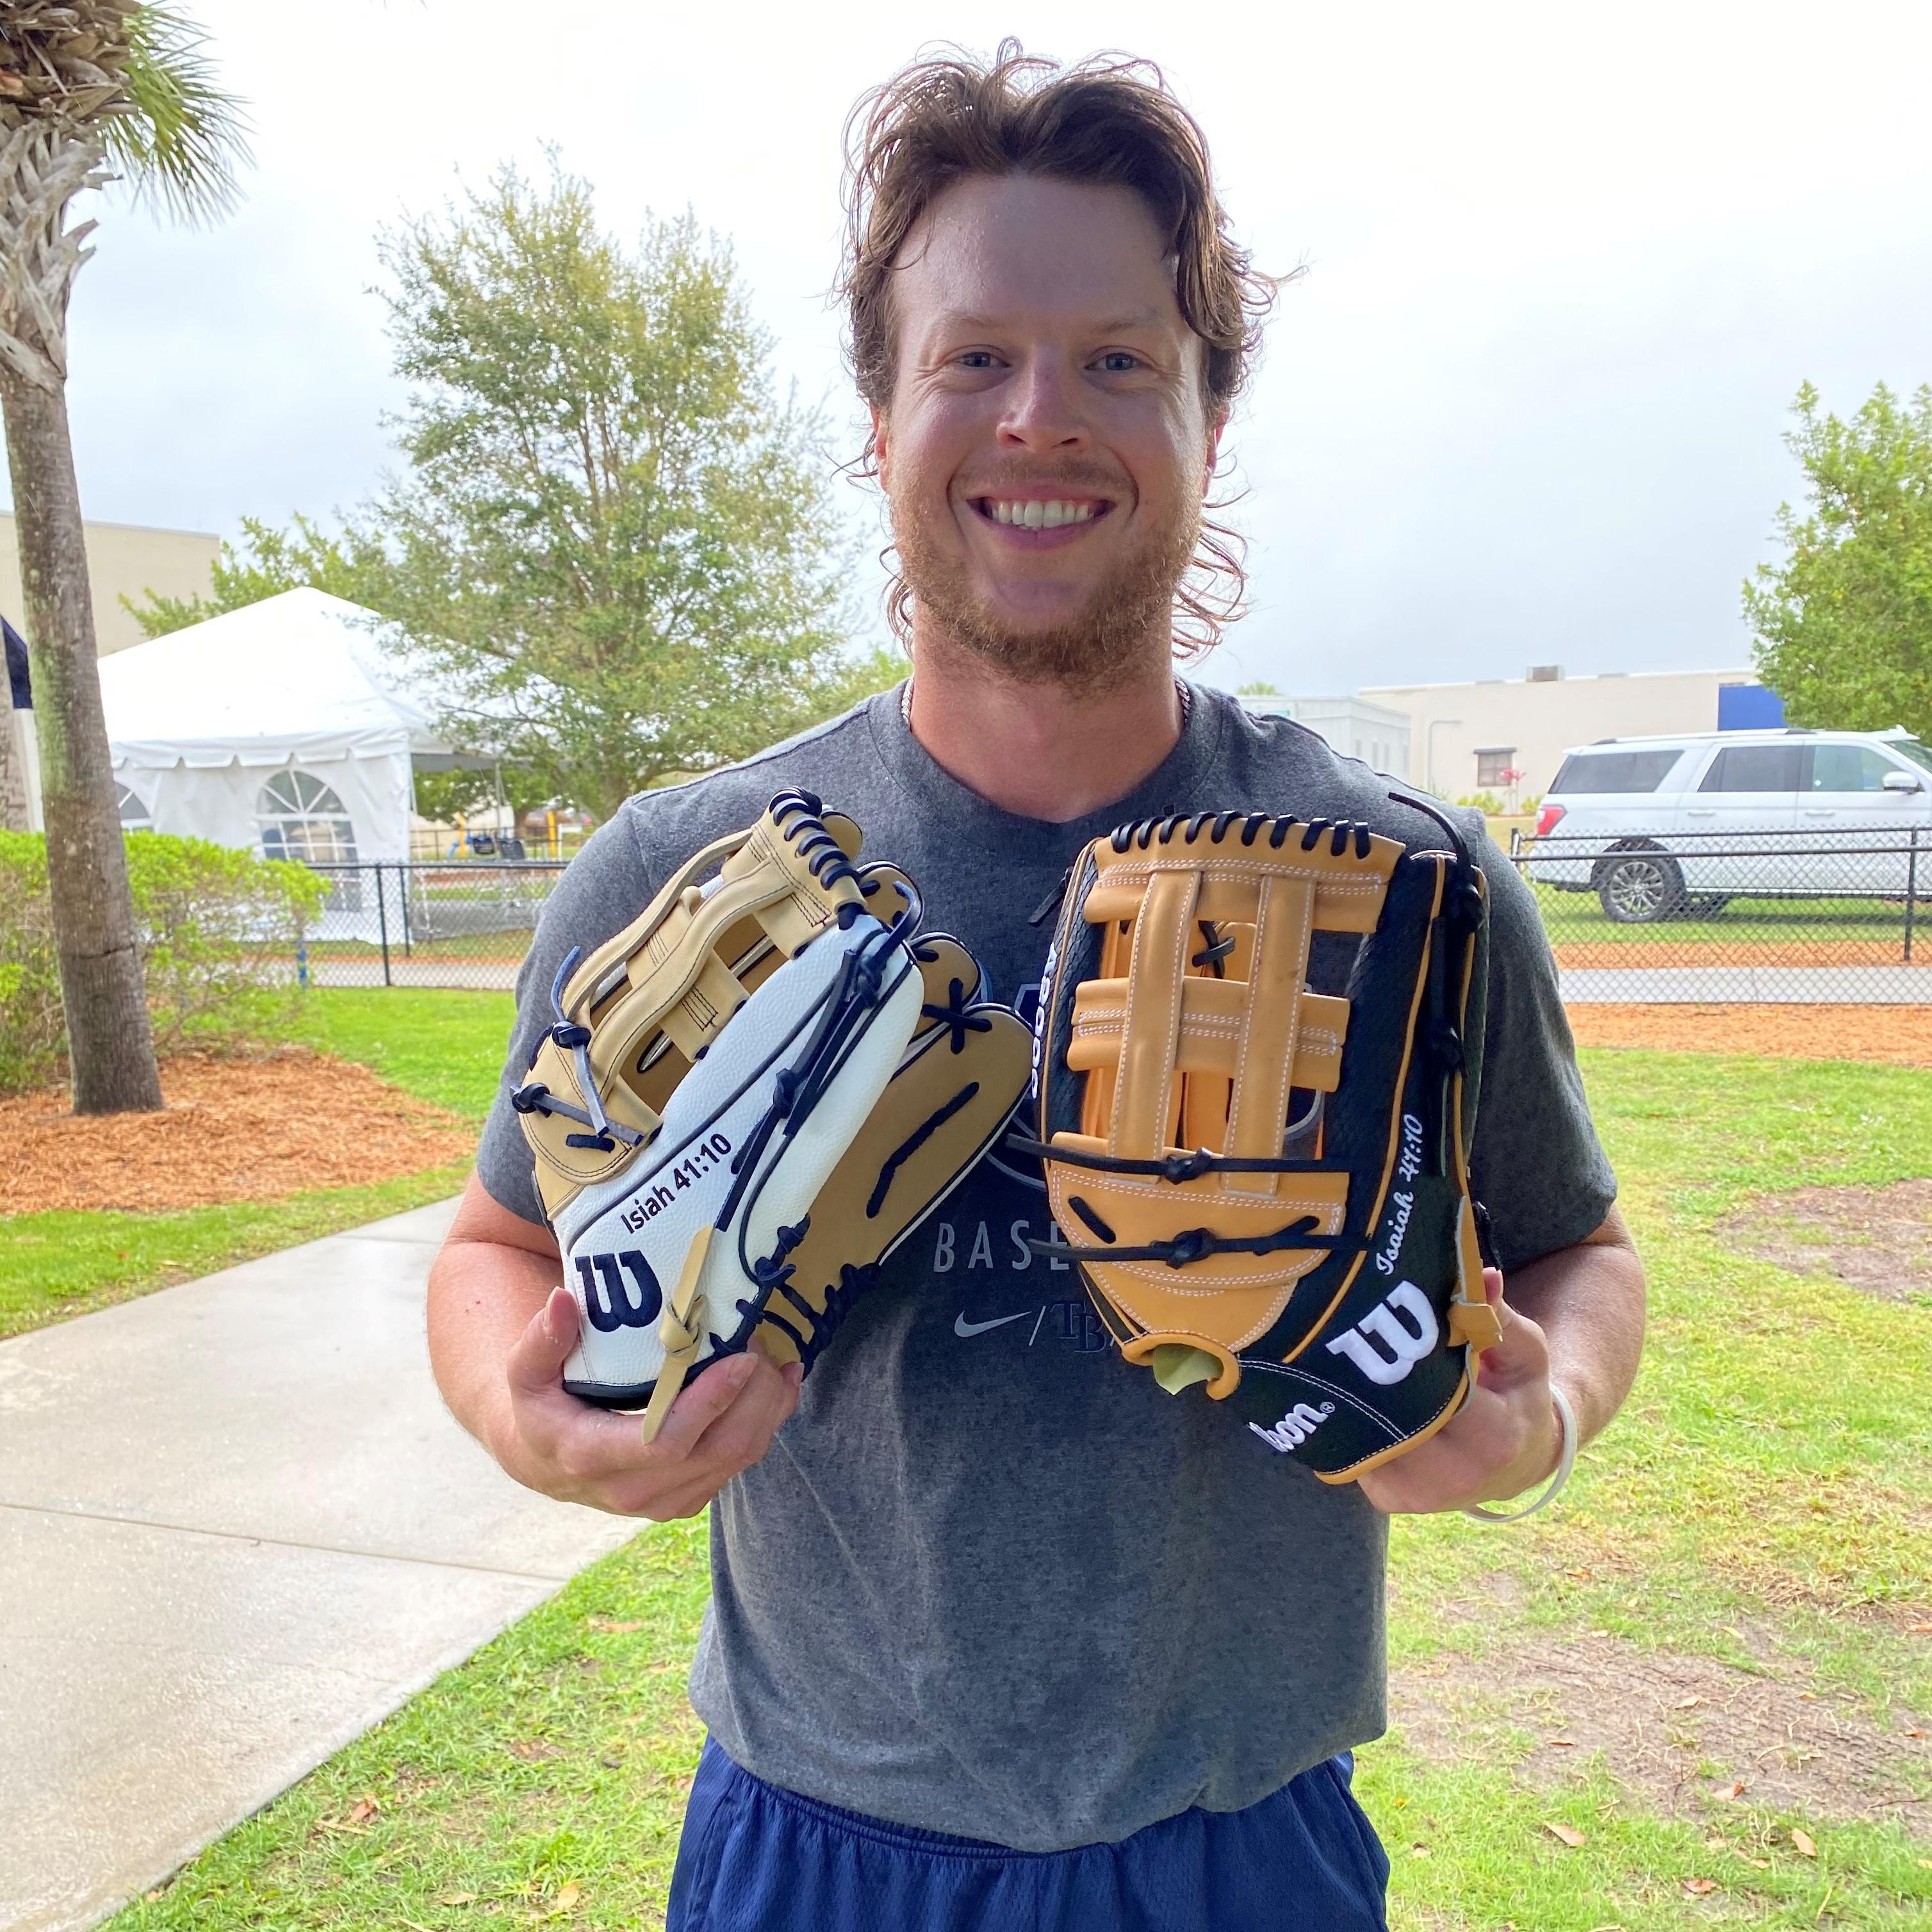 brett phillips with his gloves